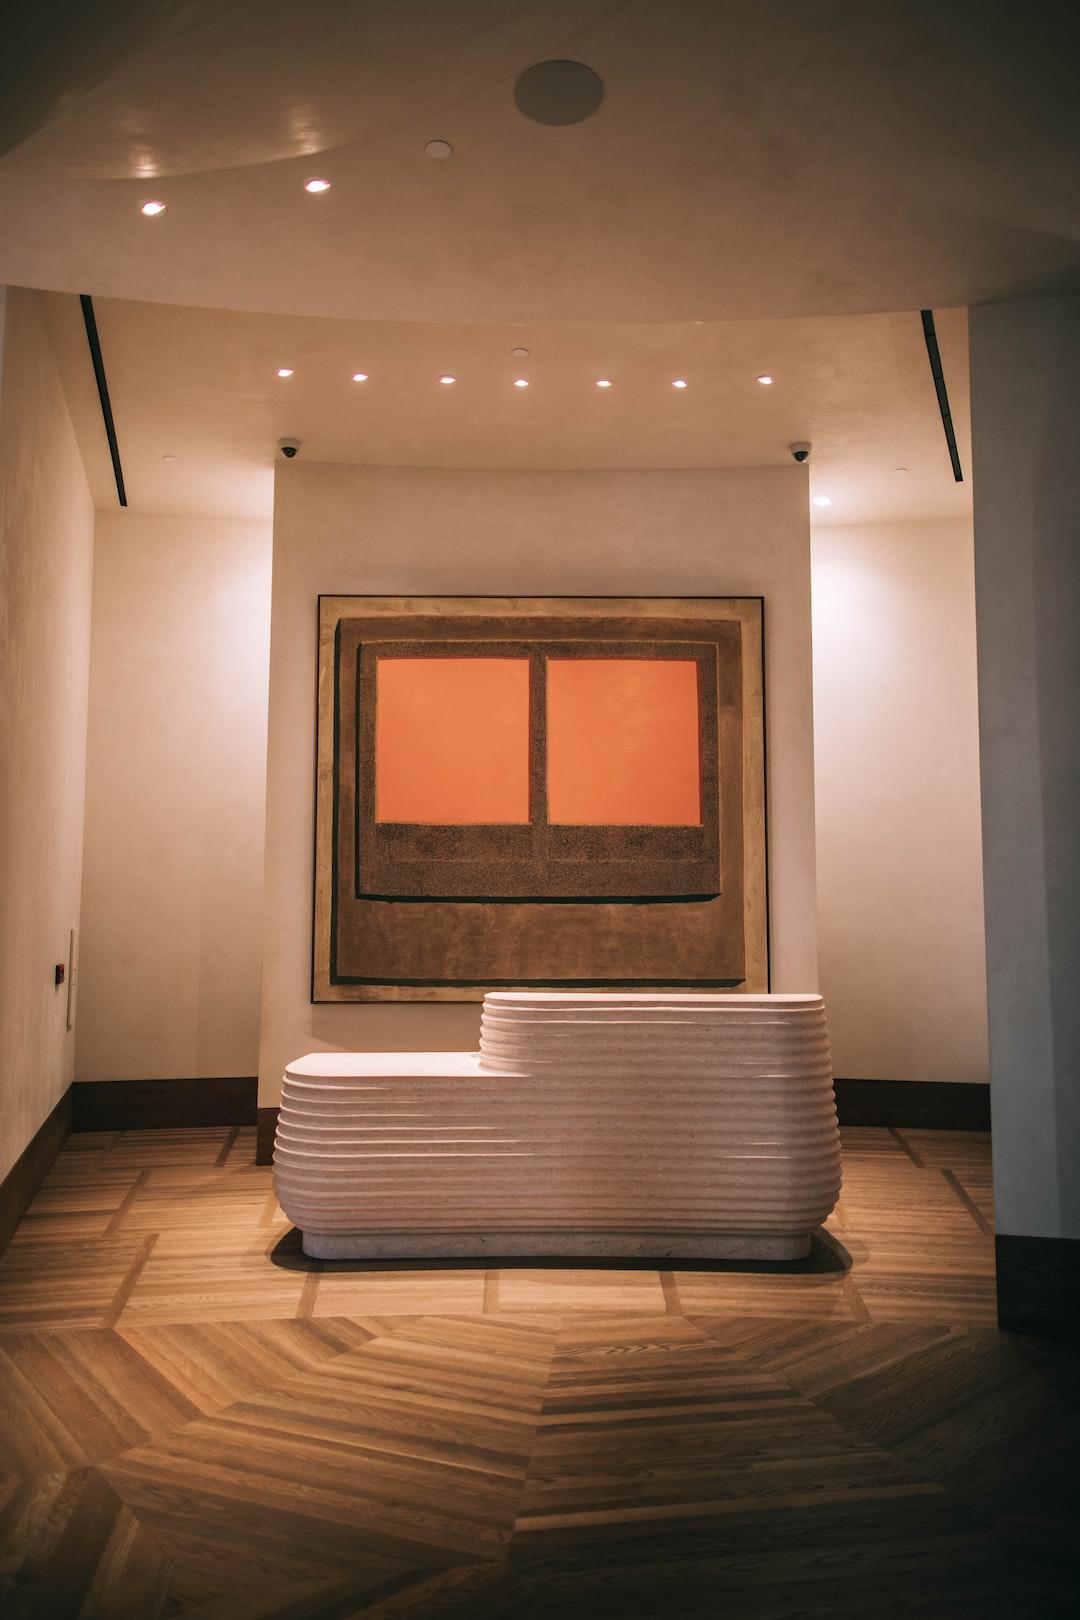 The gorgeous lobby of the Santa Monica Proper Hotel. Designed by Kelly Wearstler.